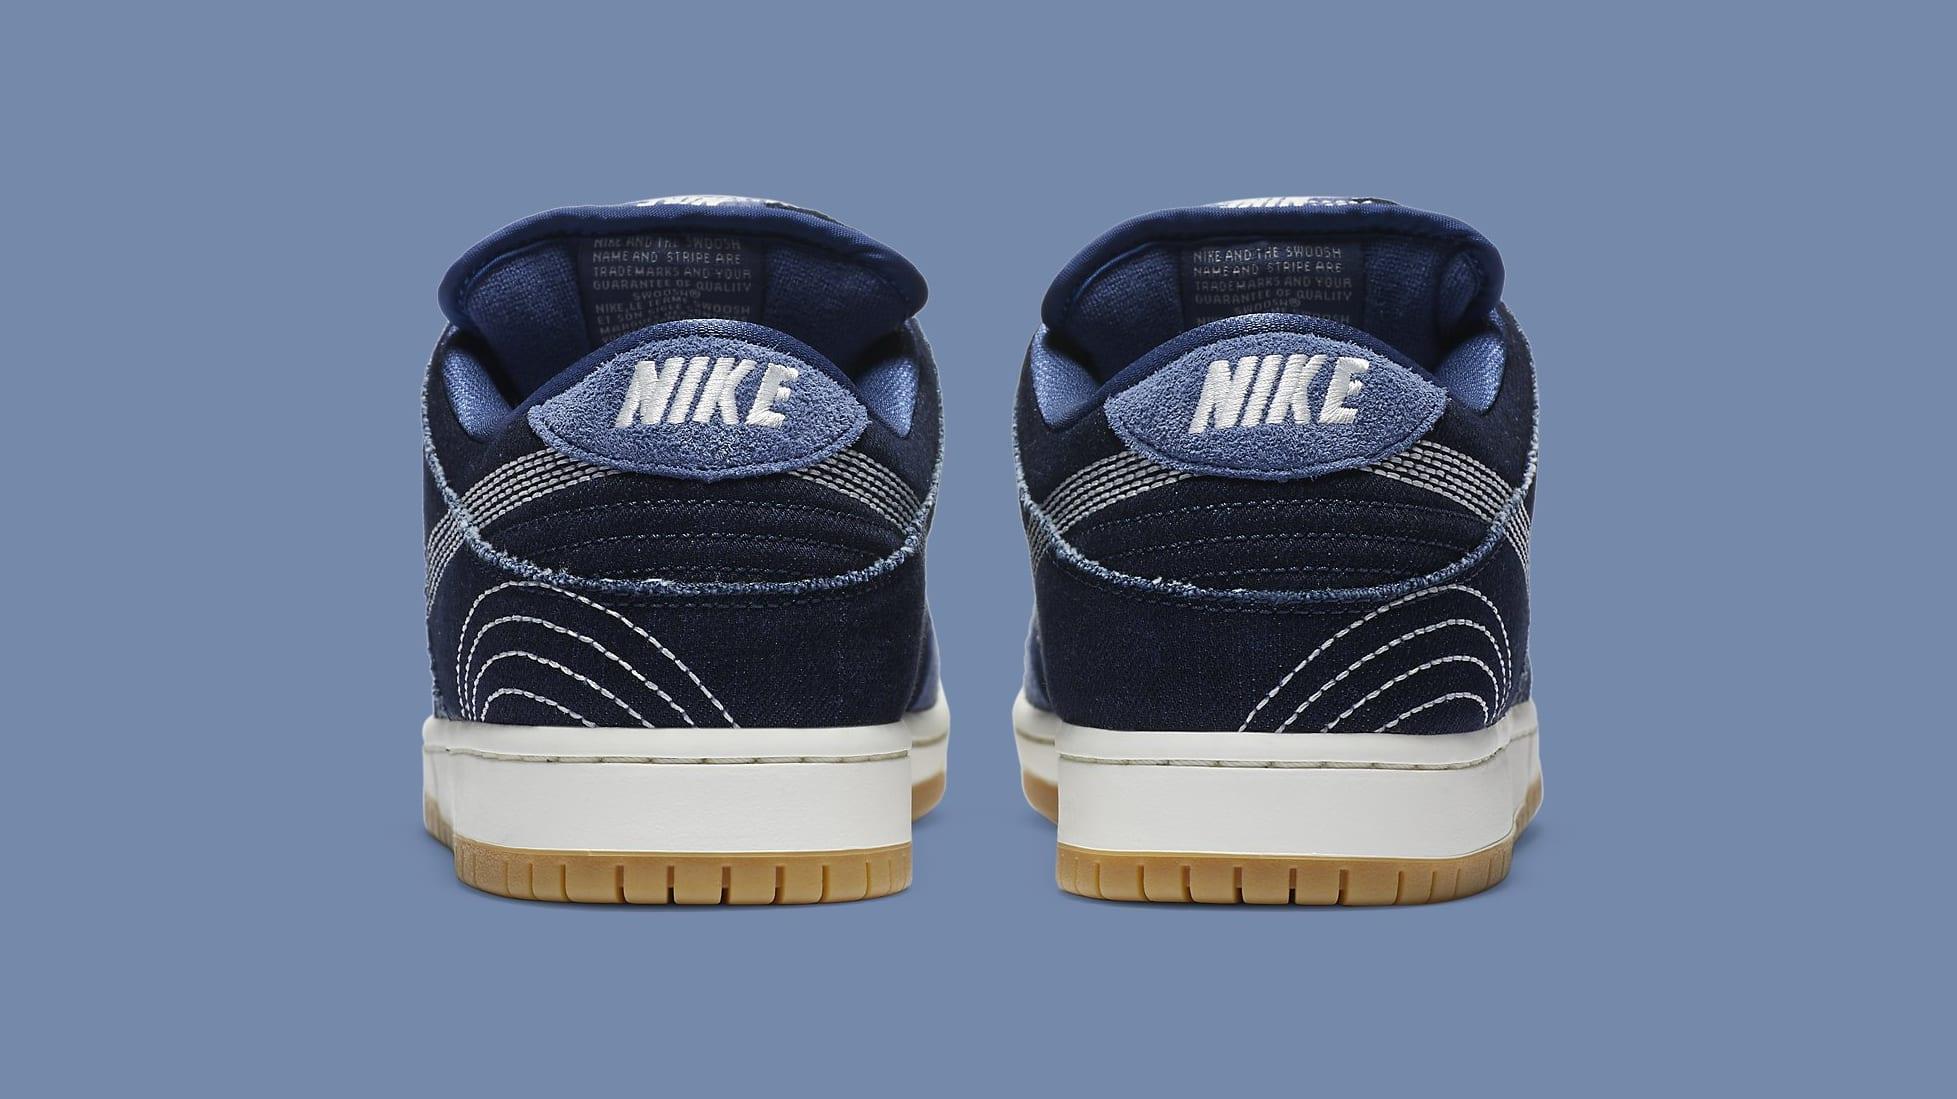 Nike SB Dunk Low 'Sashiko' CV0316-400 Heel